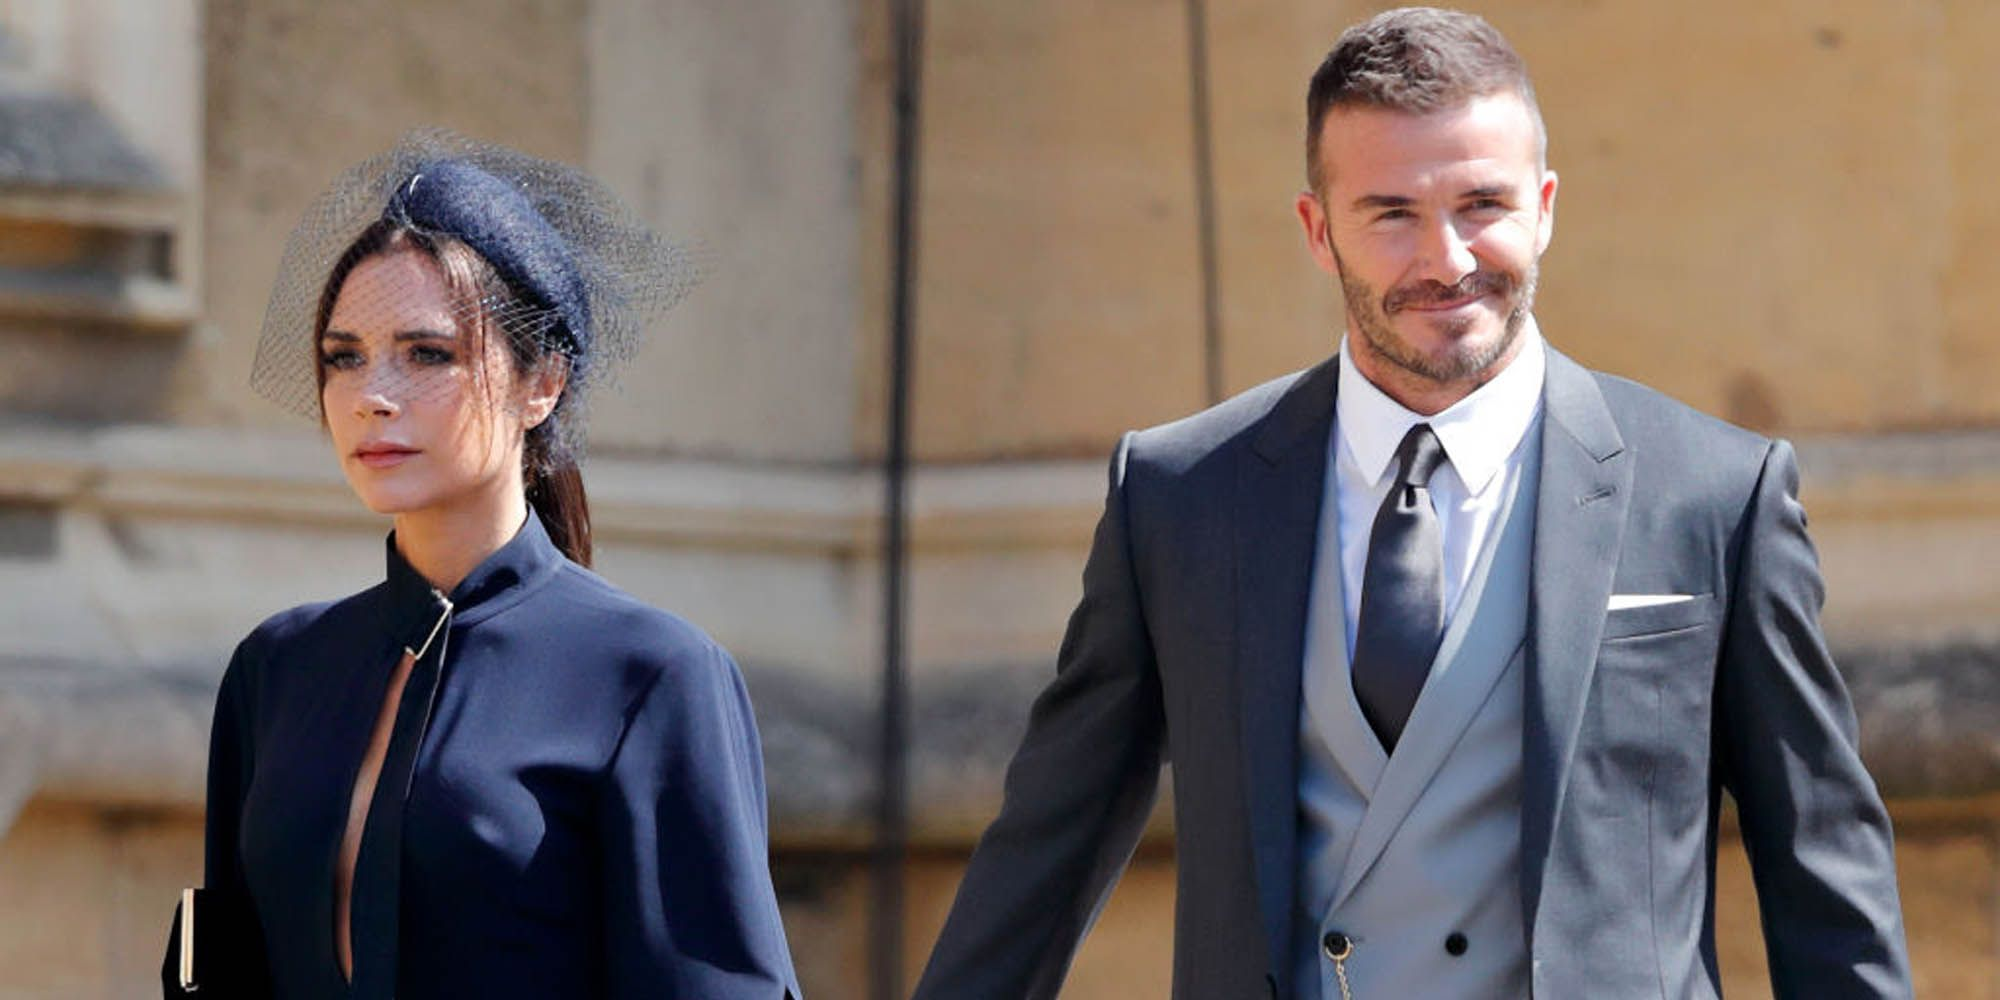 Victoria Beckham, David beckham, scheiding, roddels, The Sun, The Sunday report